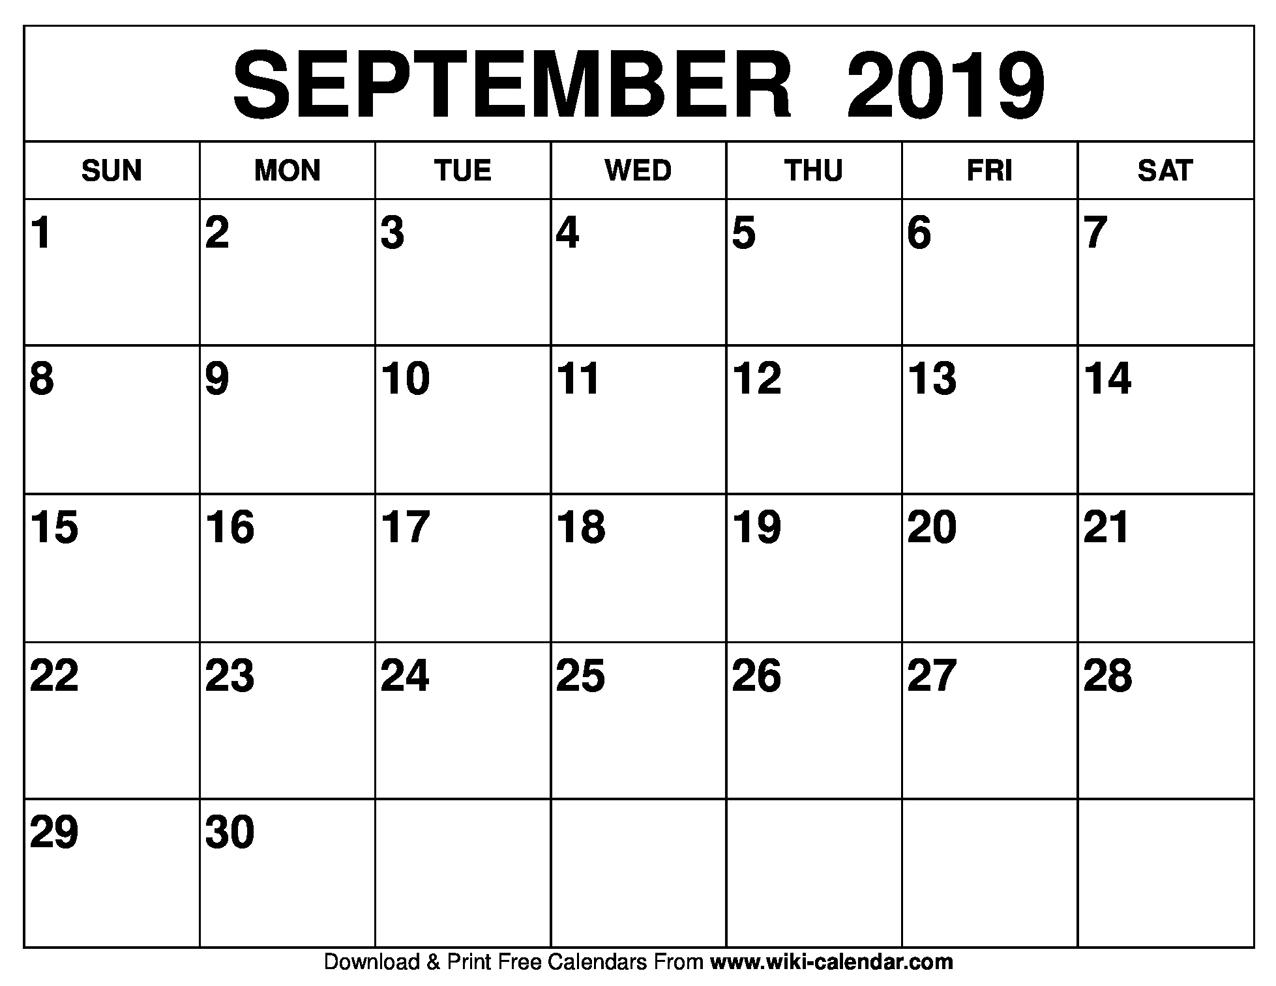 Monthly Blank September Calendar 2019 Printable Template pertaining to September Calendar Printable Template Blank